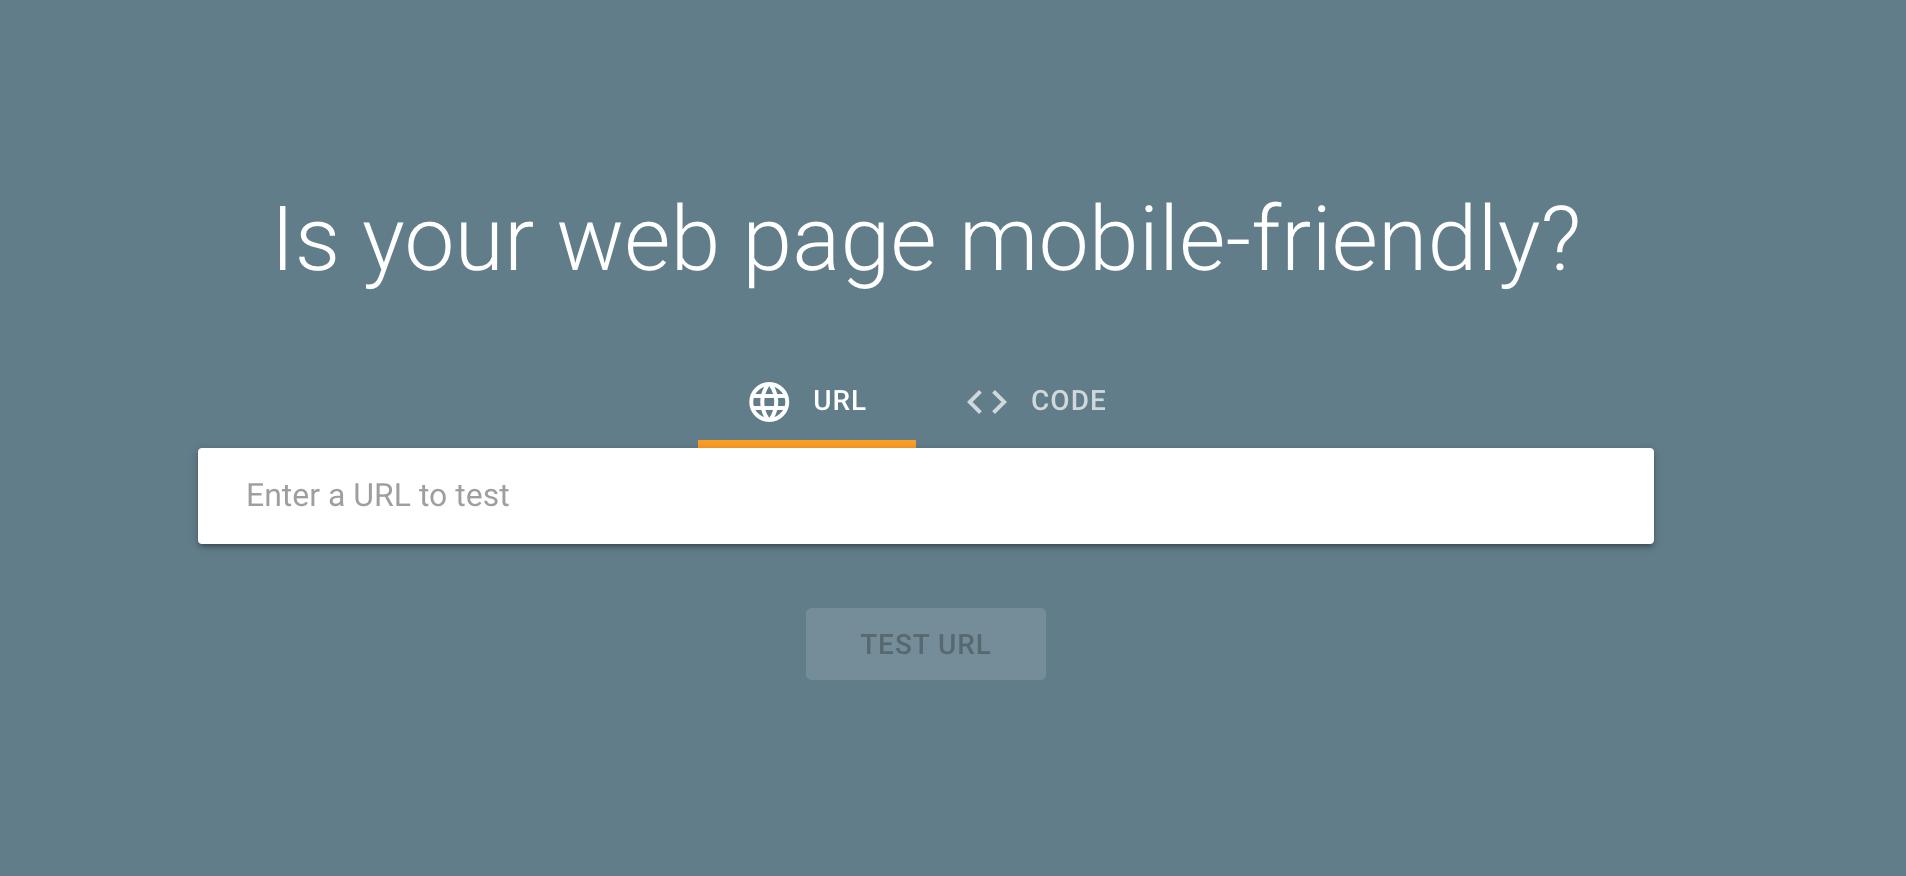 Google ranking signals: Google page speed insights